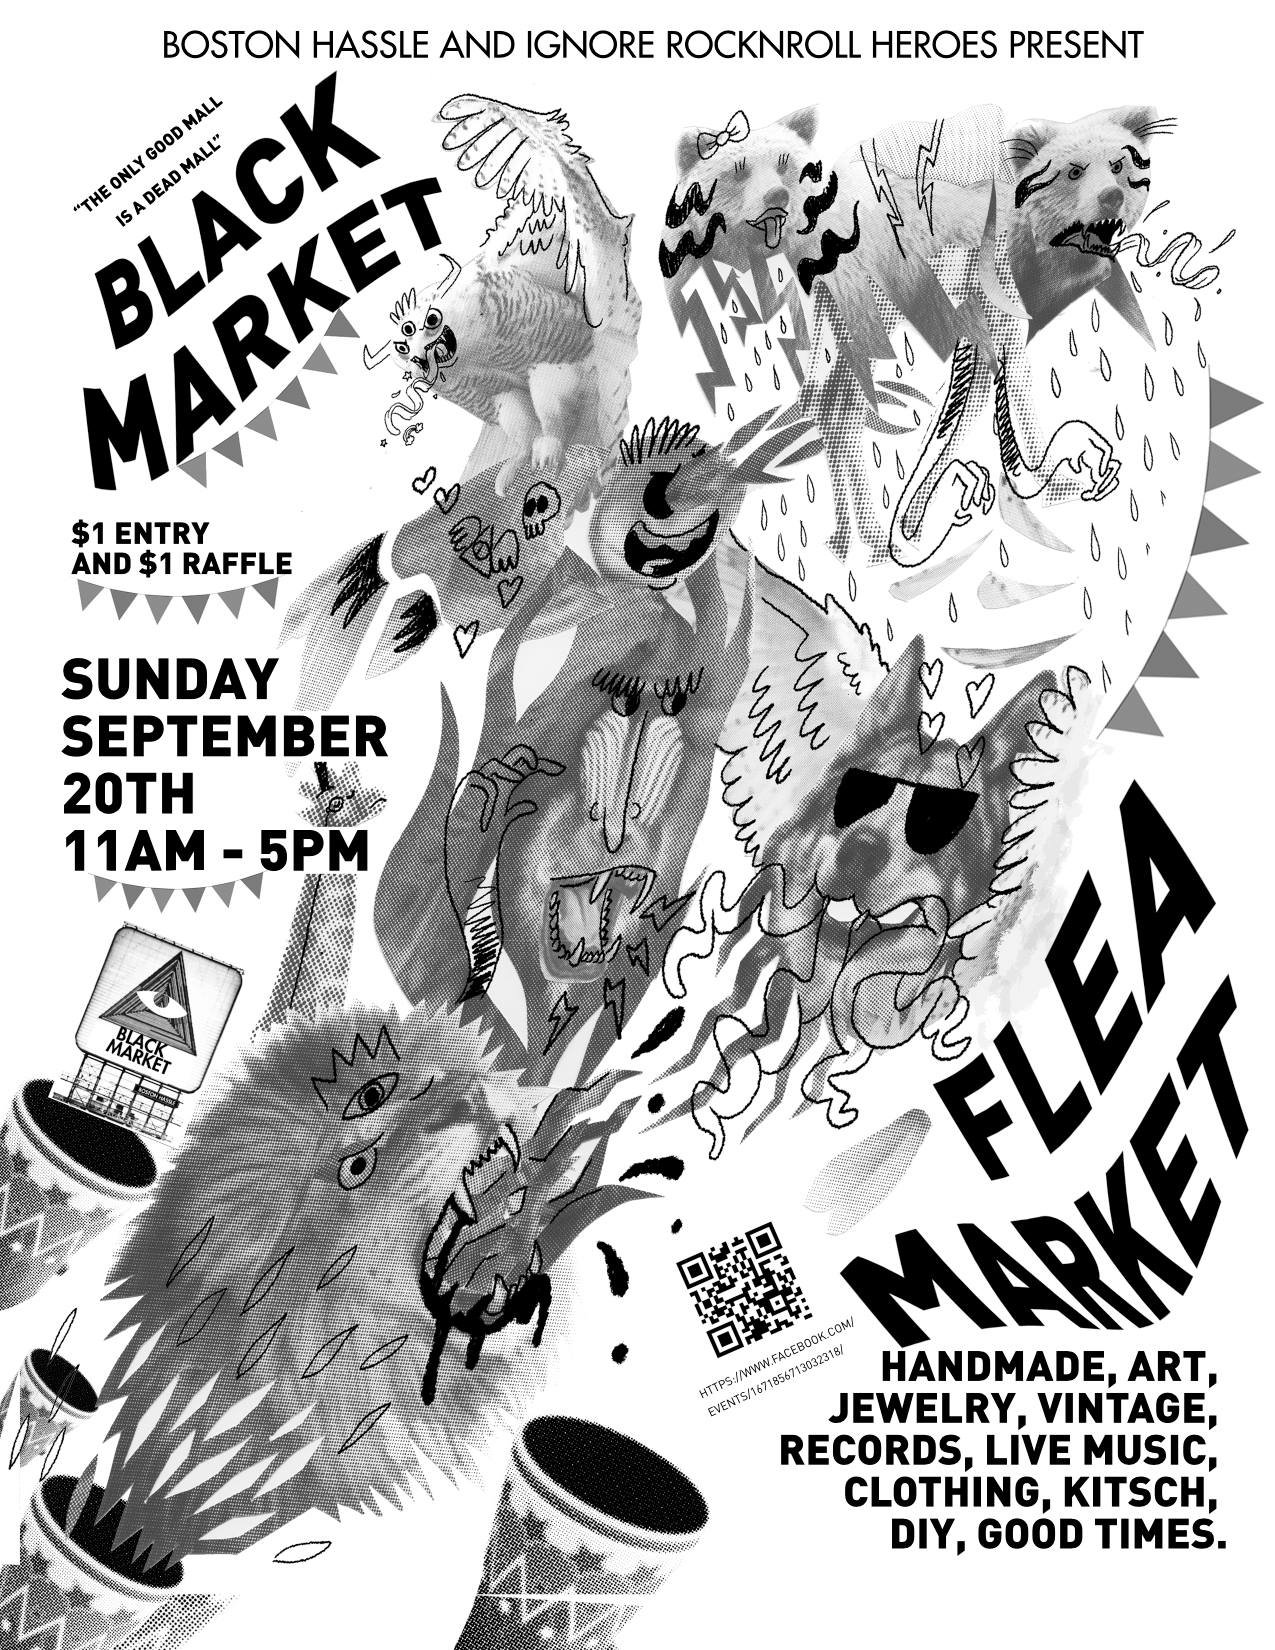 3f8f779c2a651 Boston Hassle and Ignore Rock'n'Roll Heroes Present: September Black  Market! (art/record/flea/artisan market)   BOSTON HASSLE